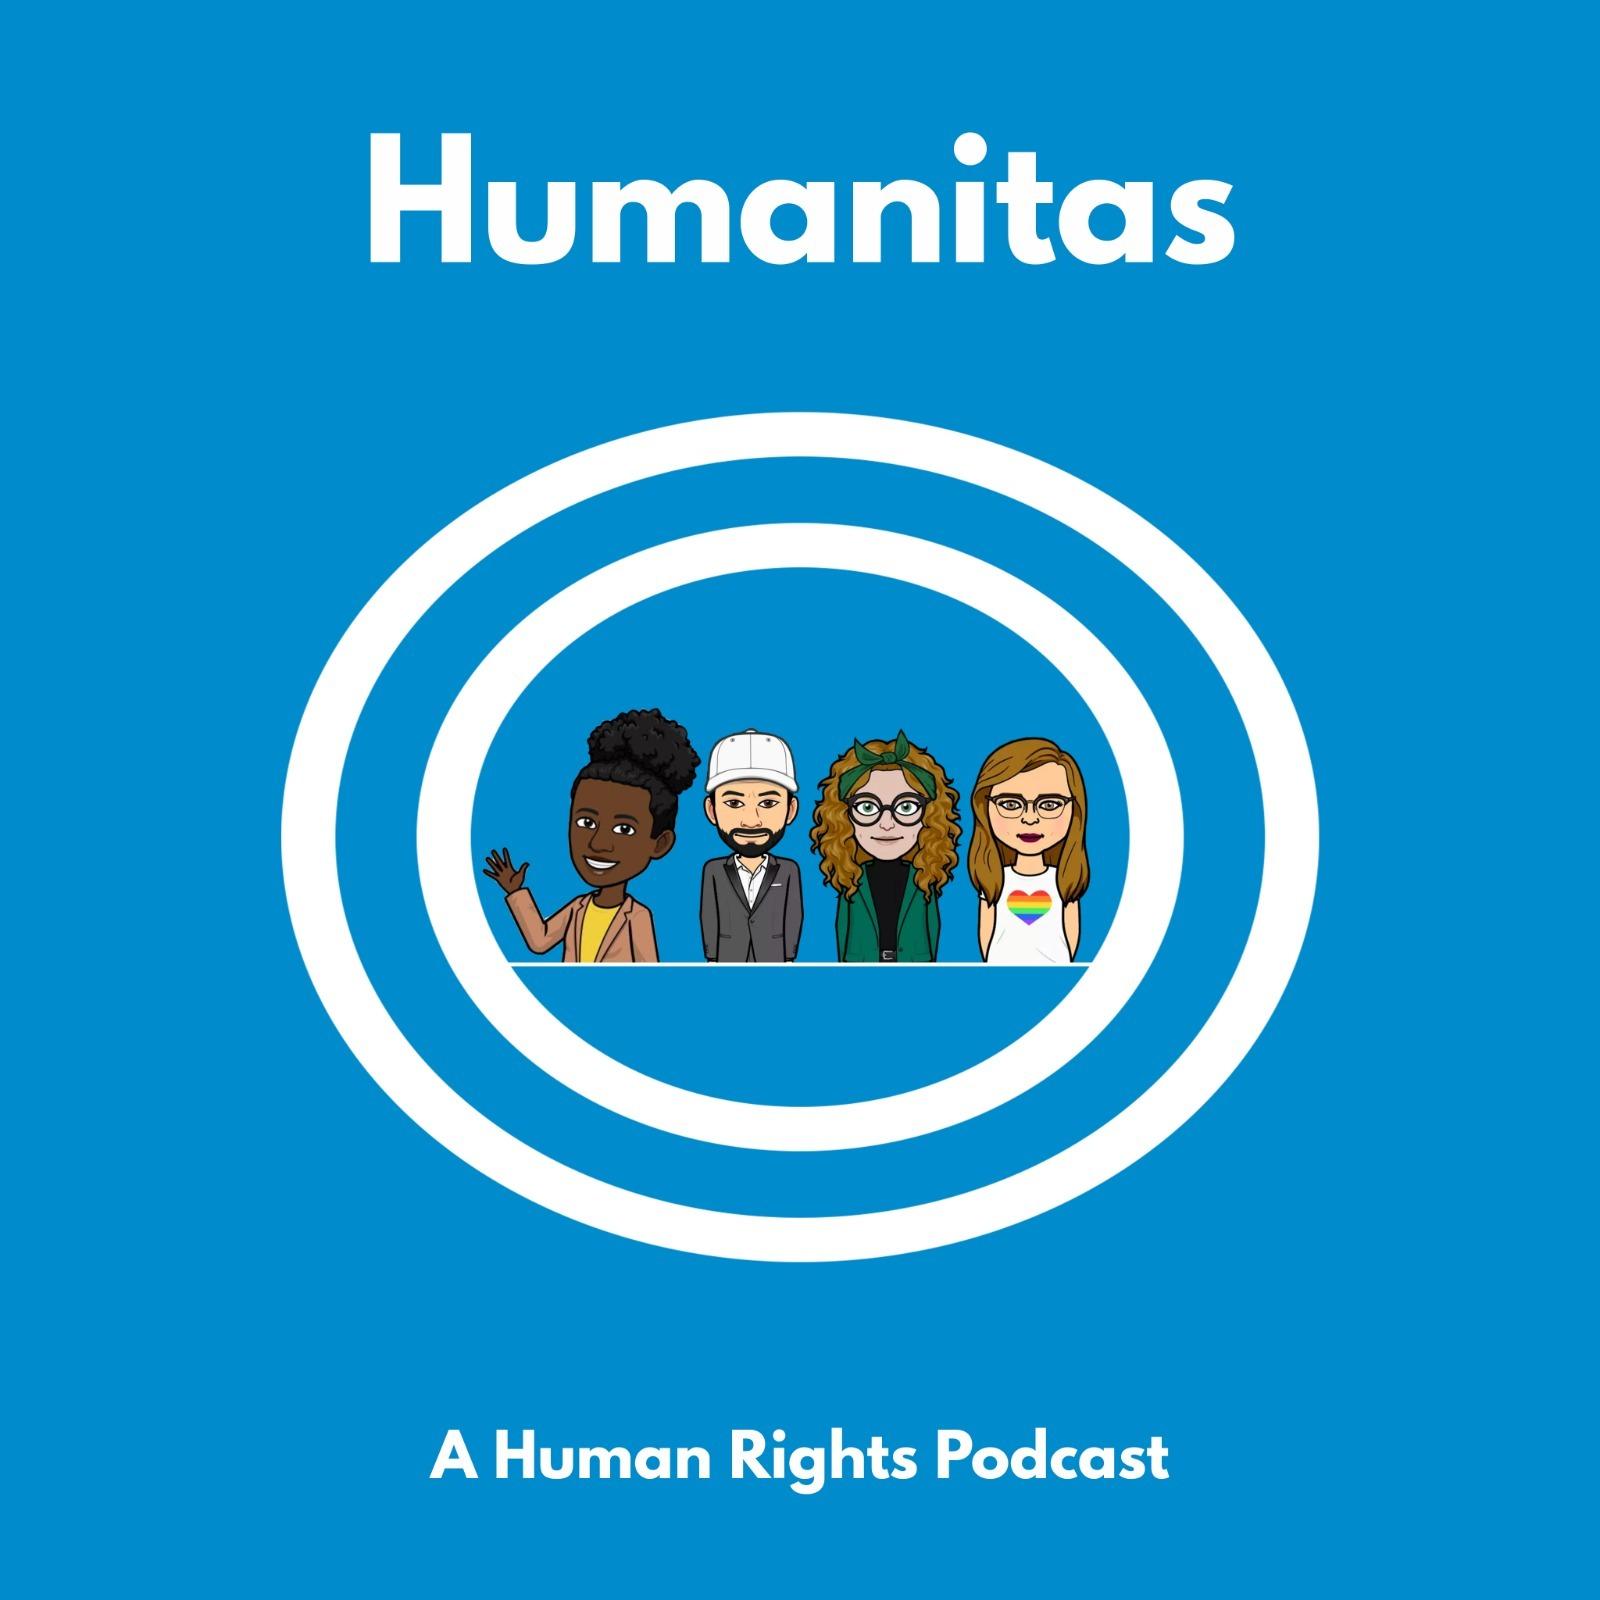 Humanitas podcast